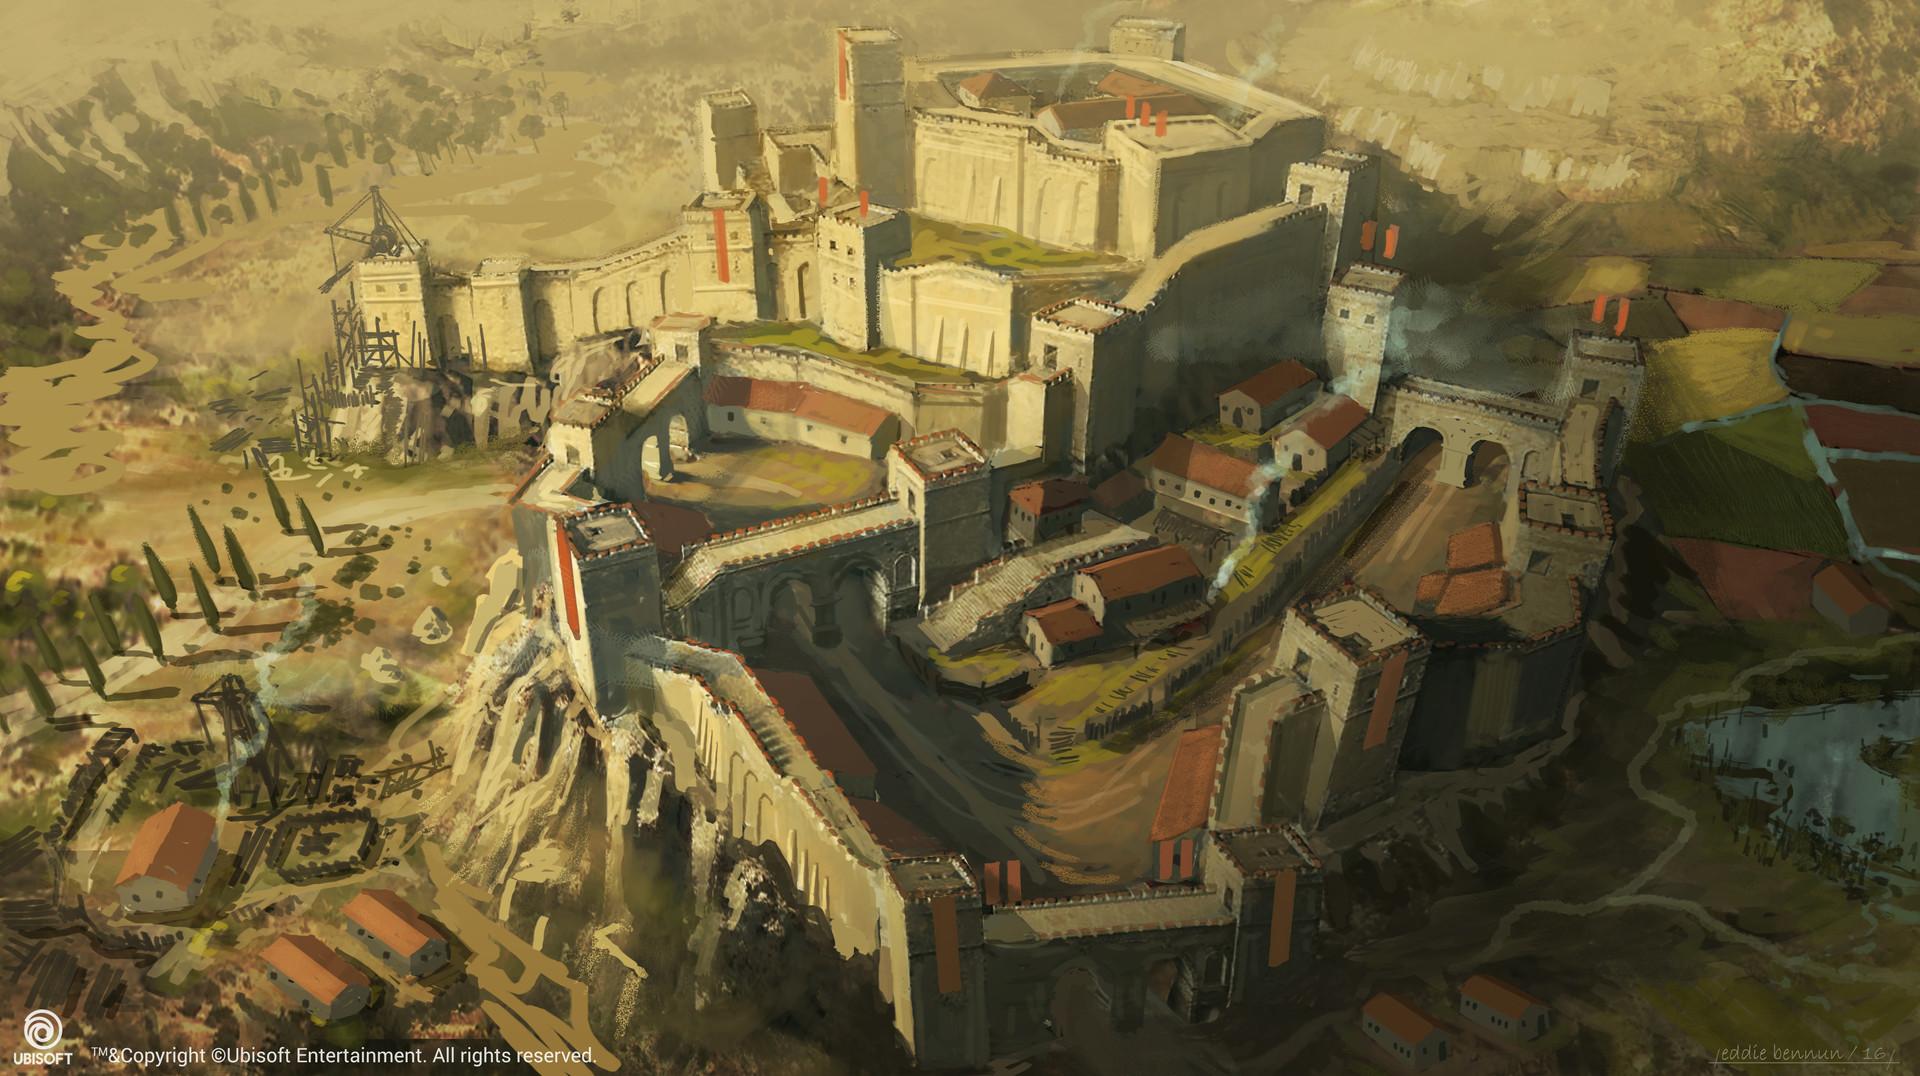 eddie-bennun-ace-env-roman-citadel-overview-logo-eddiebennun